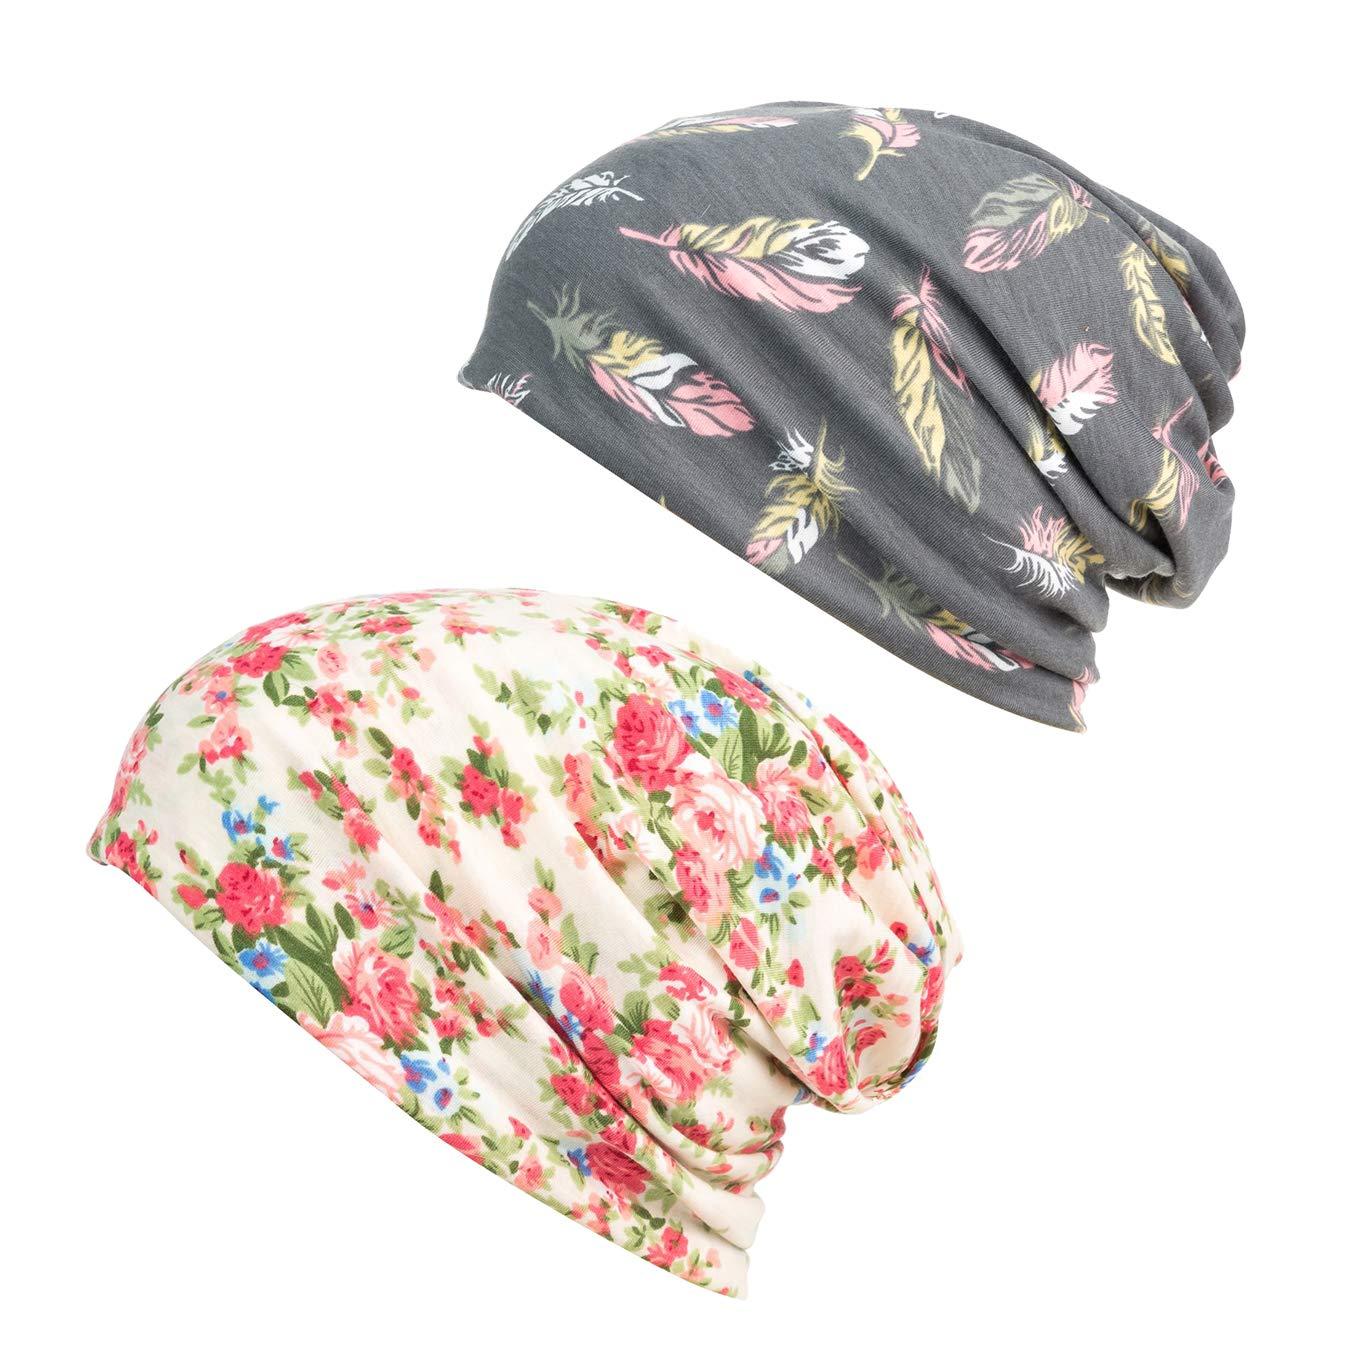 HONENNA Printed Turban Headband Chemo Cap Cotton Soft Sleep Beanie ... (Gray+Begin) by HONENNA